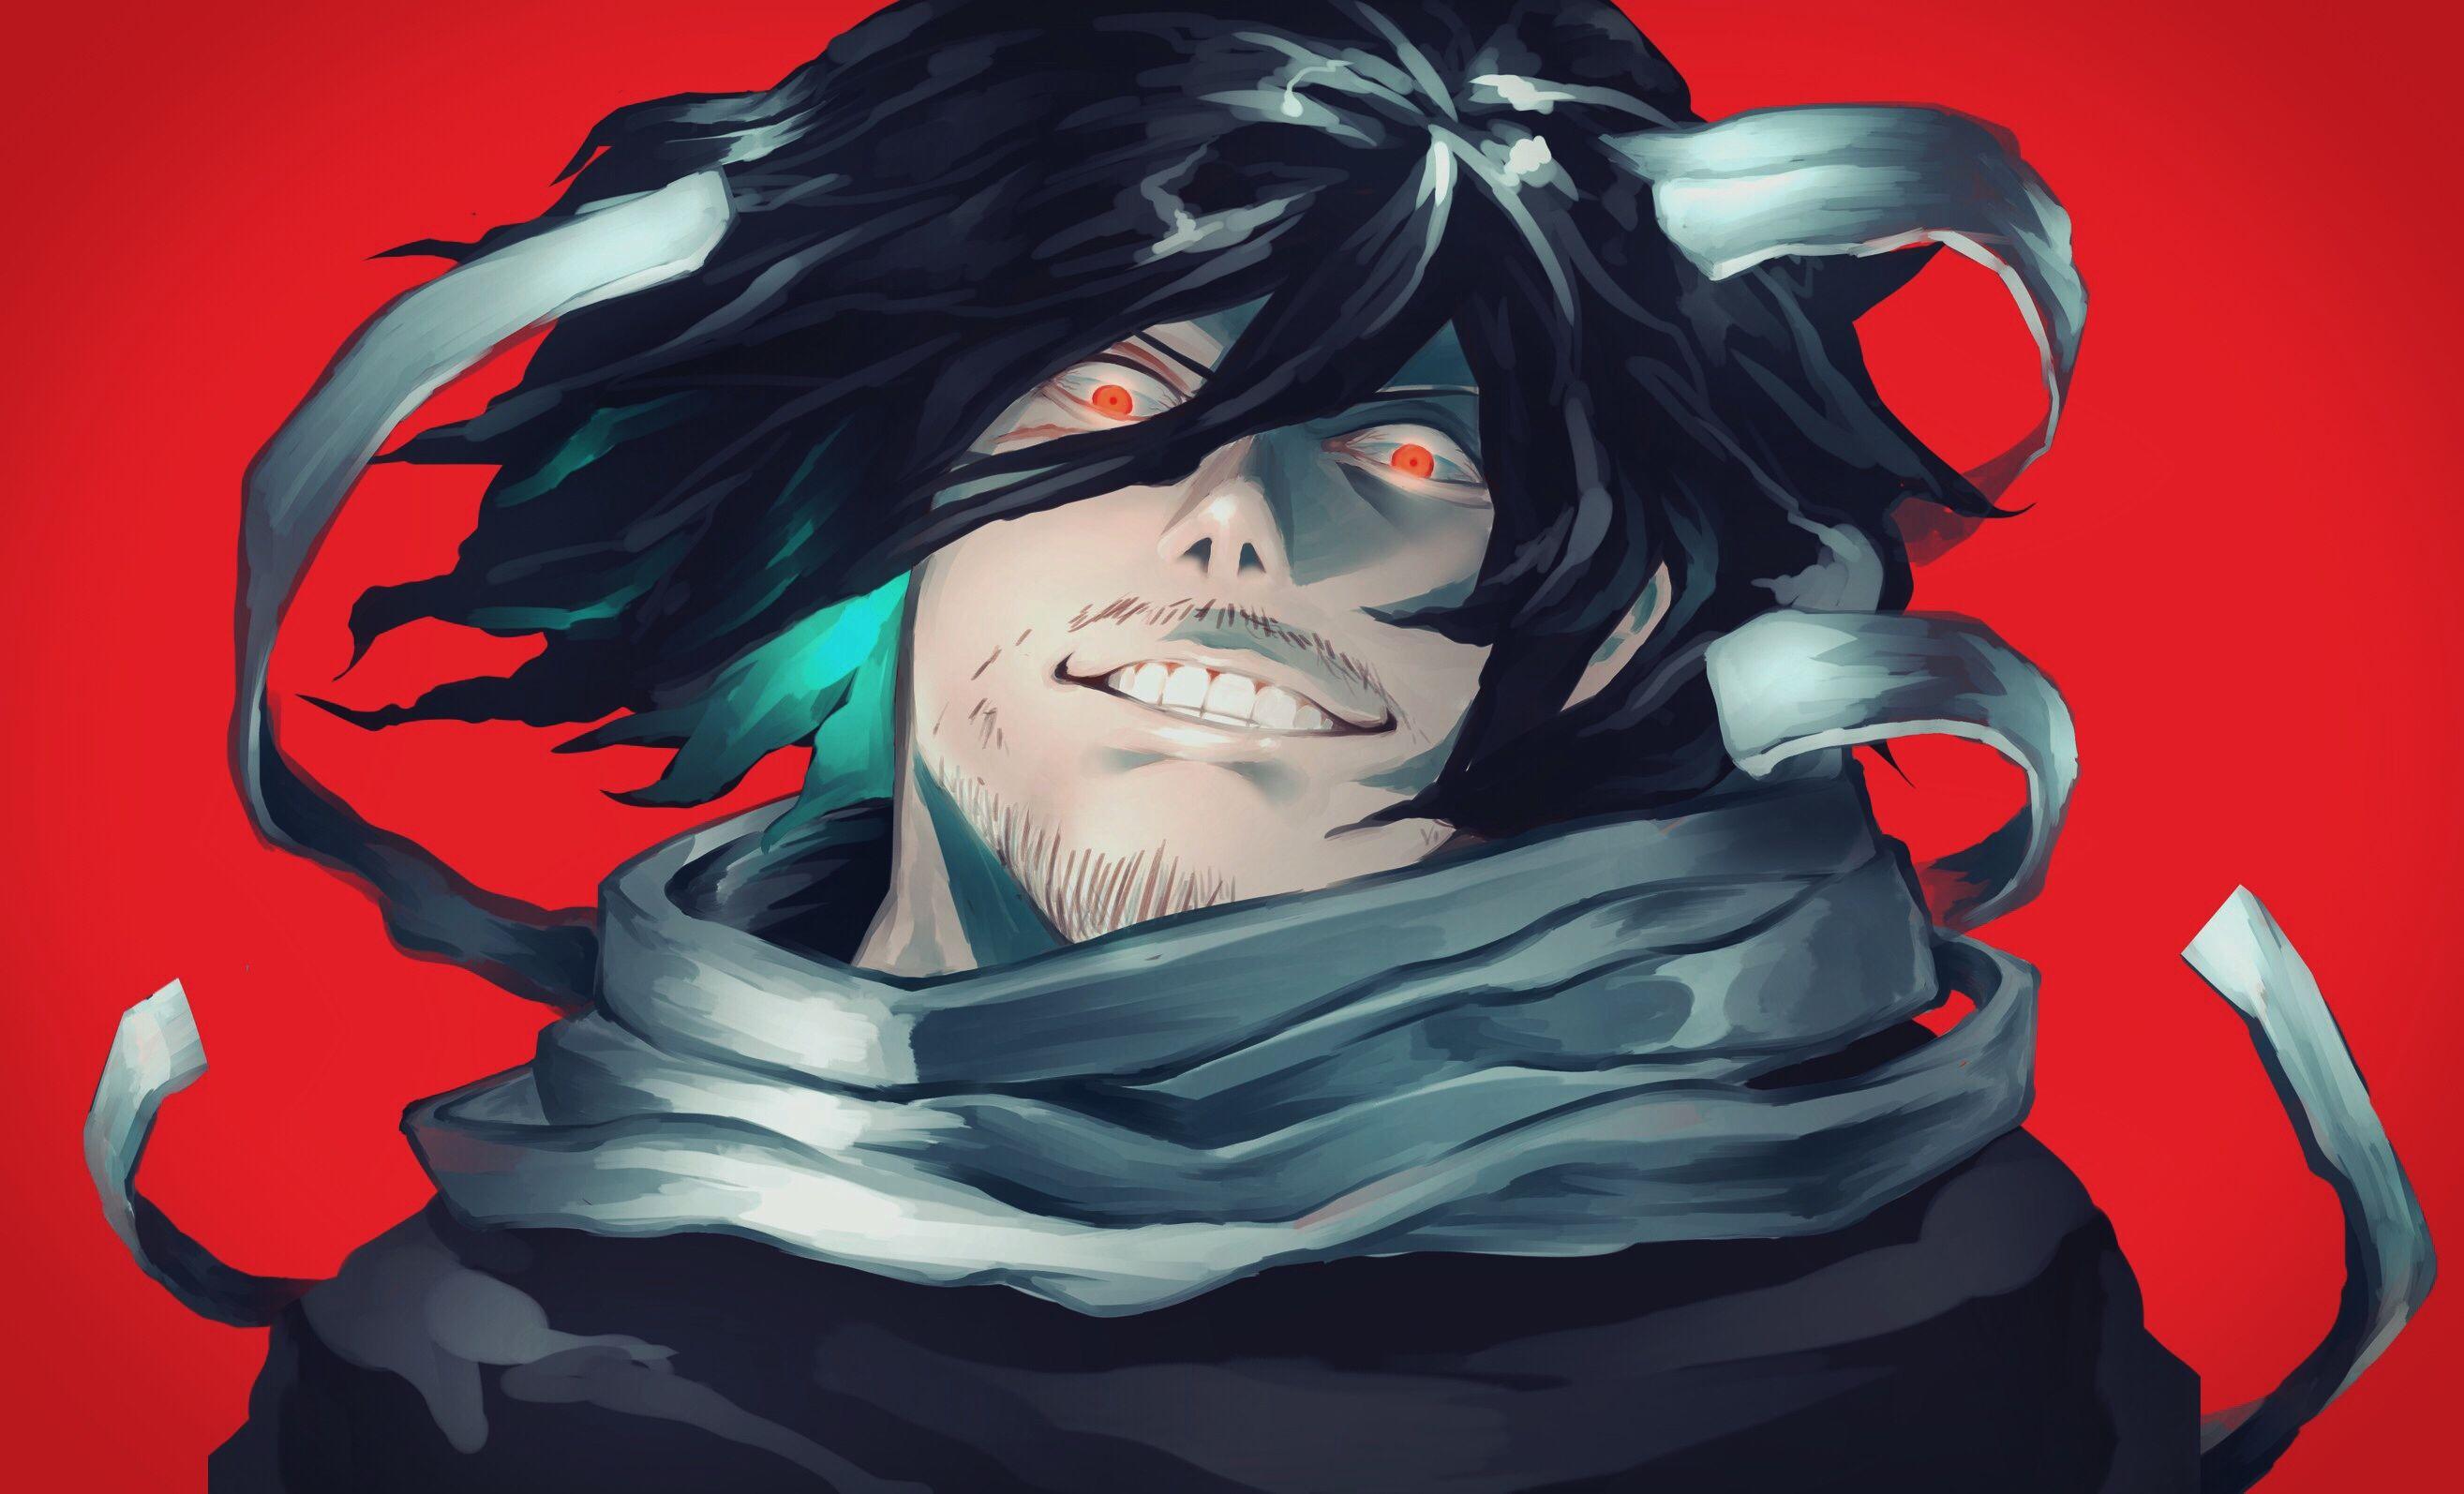 Boku No Hero Academia Aizawa Shouta Creepy Smile My Hero My Hero Academia